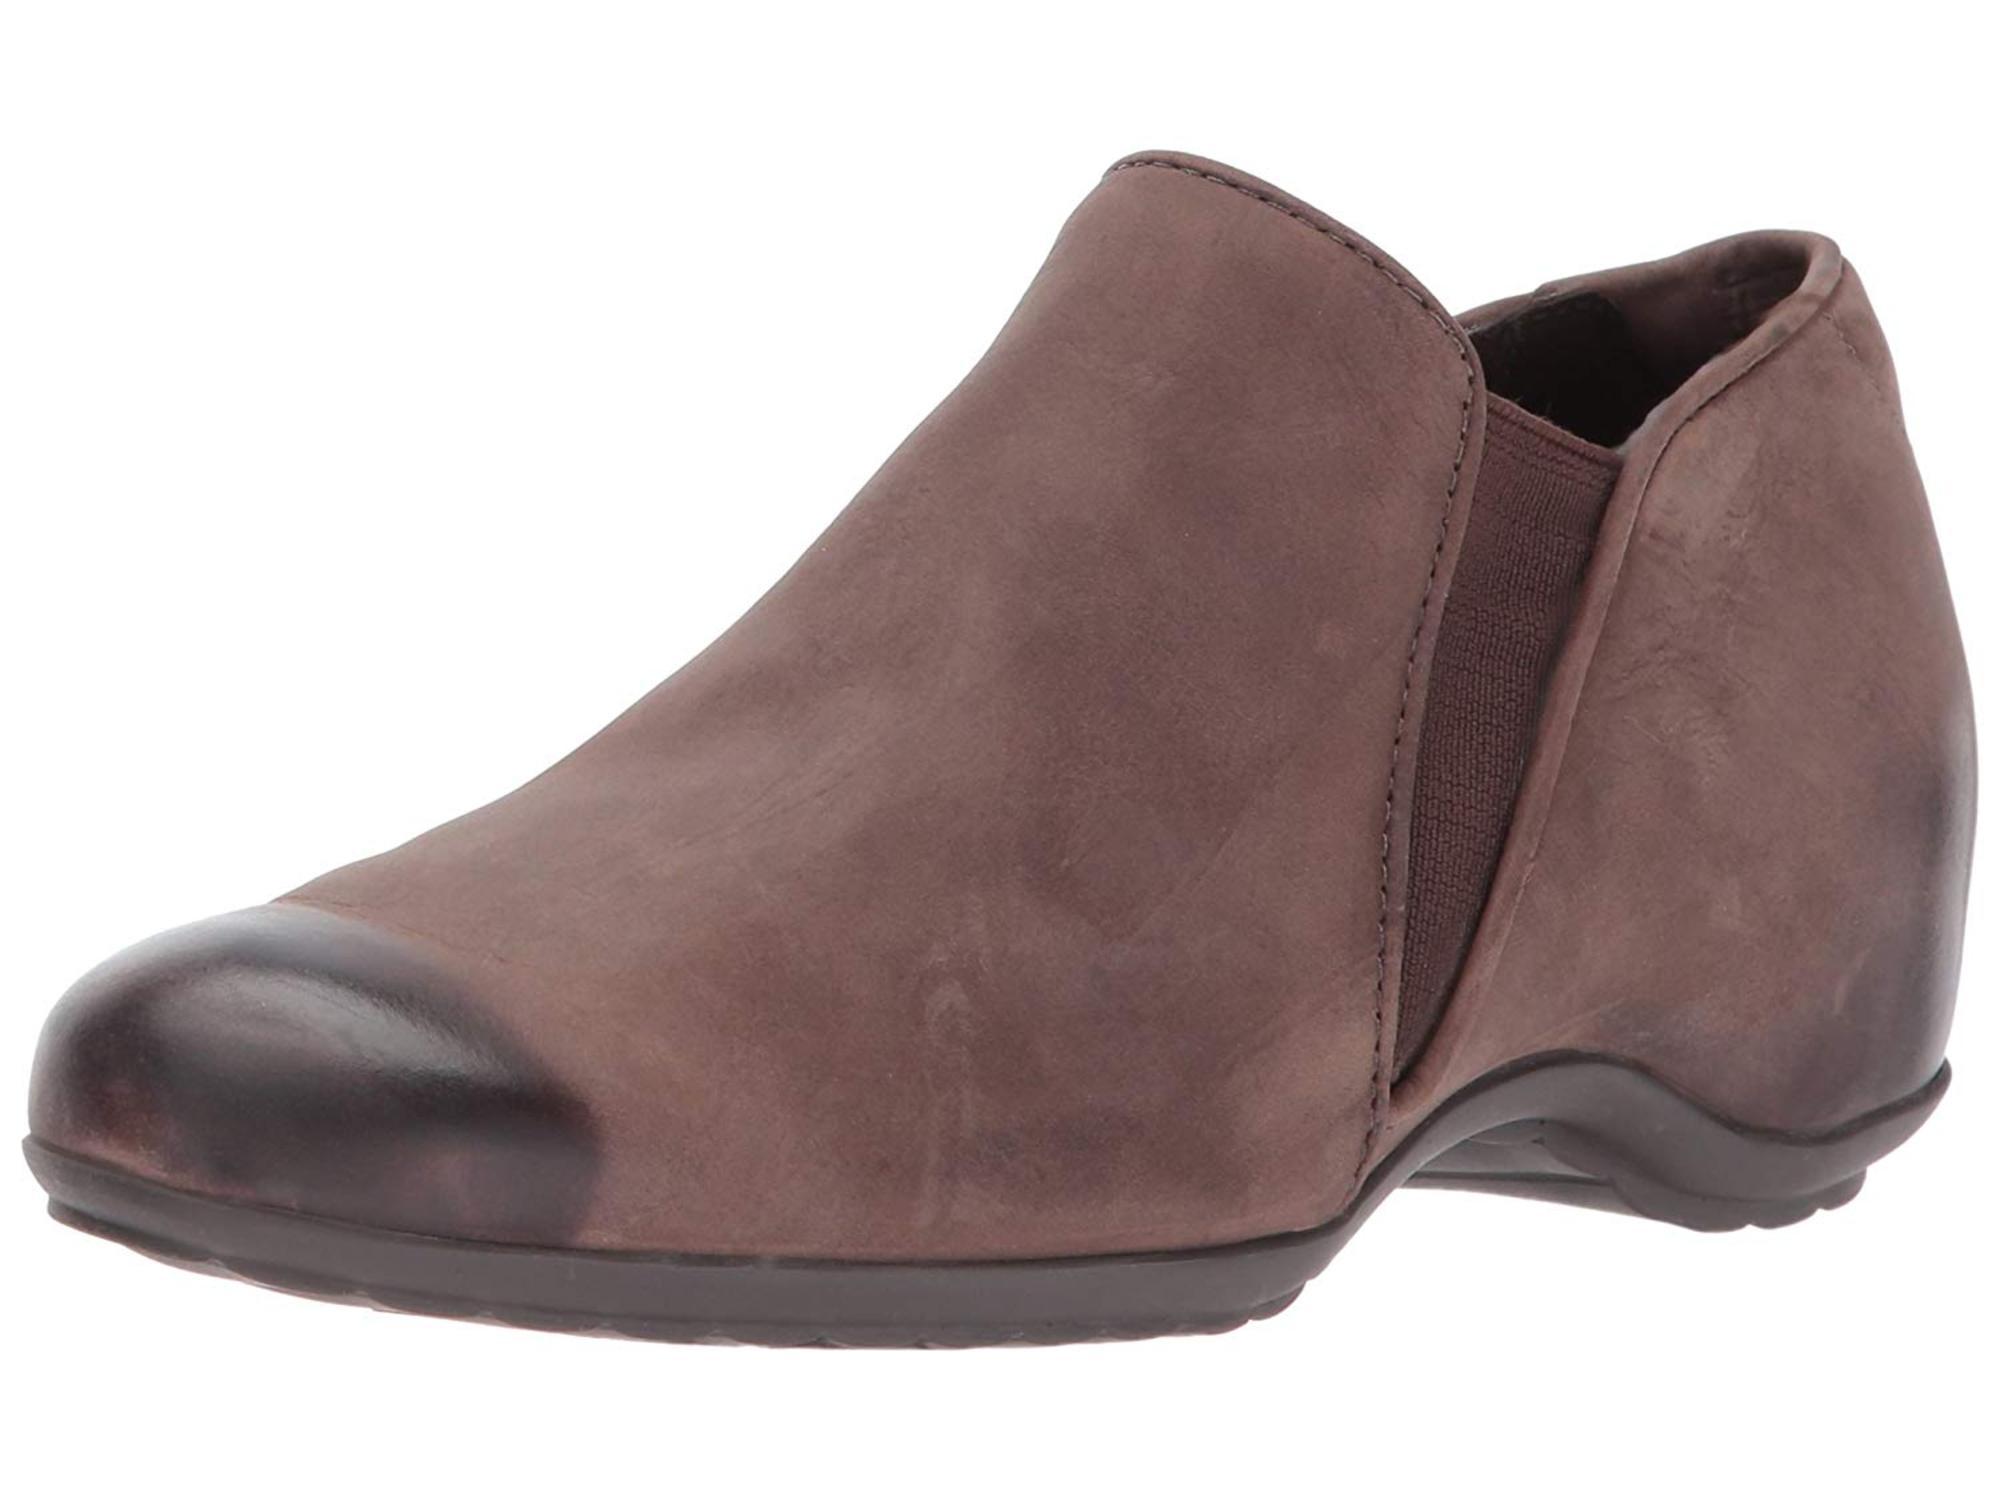 967236708bb24 Walking Cradles Womens Keaton Closed Toe Loafers